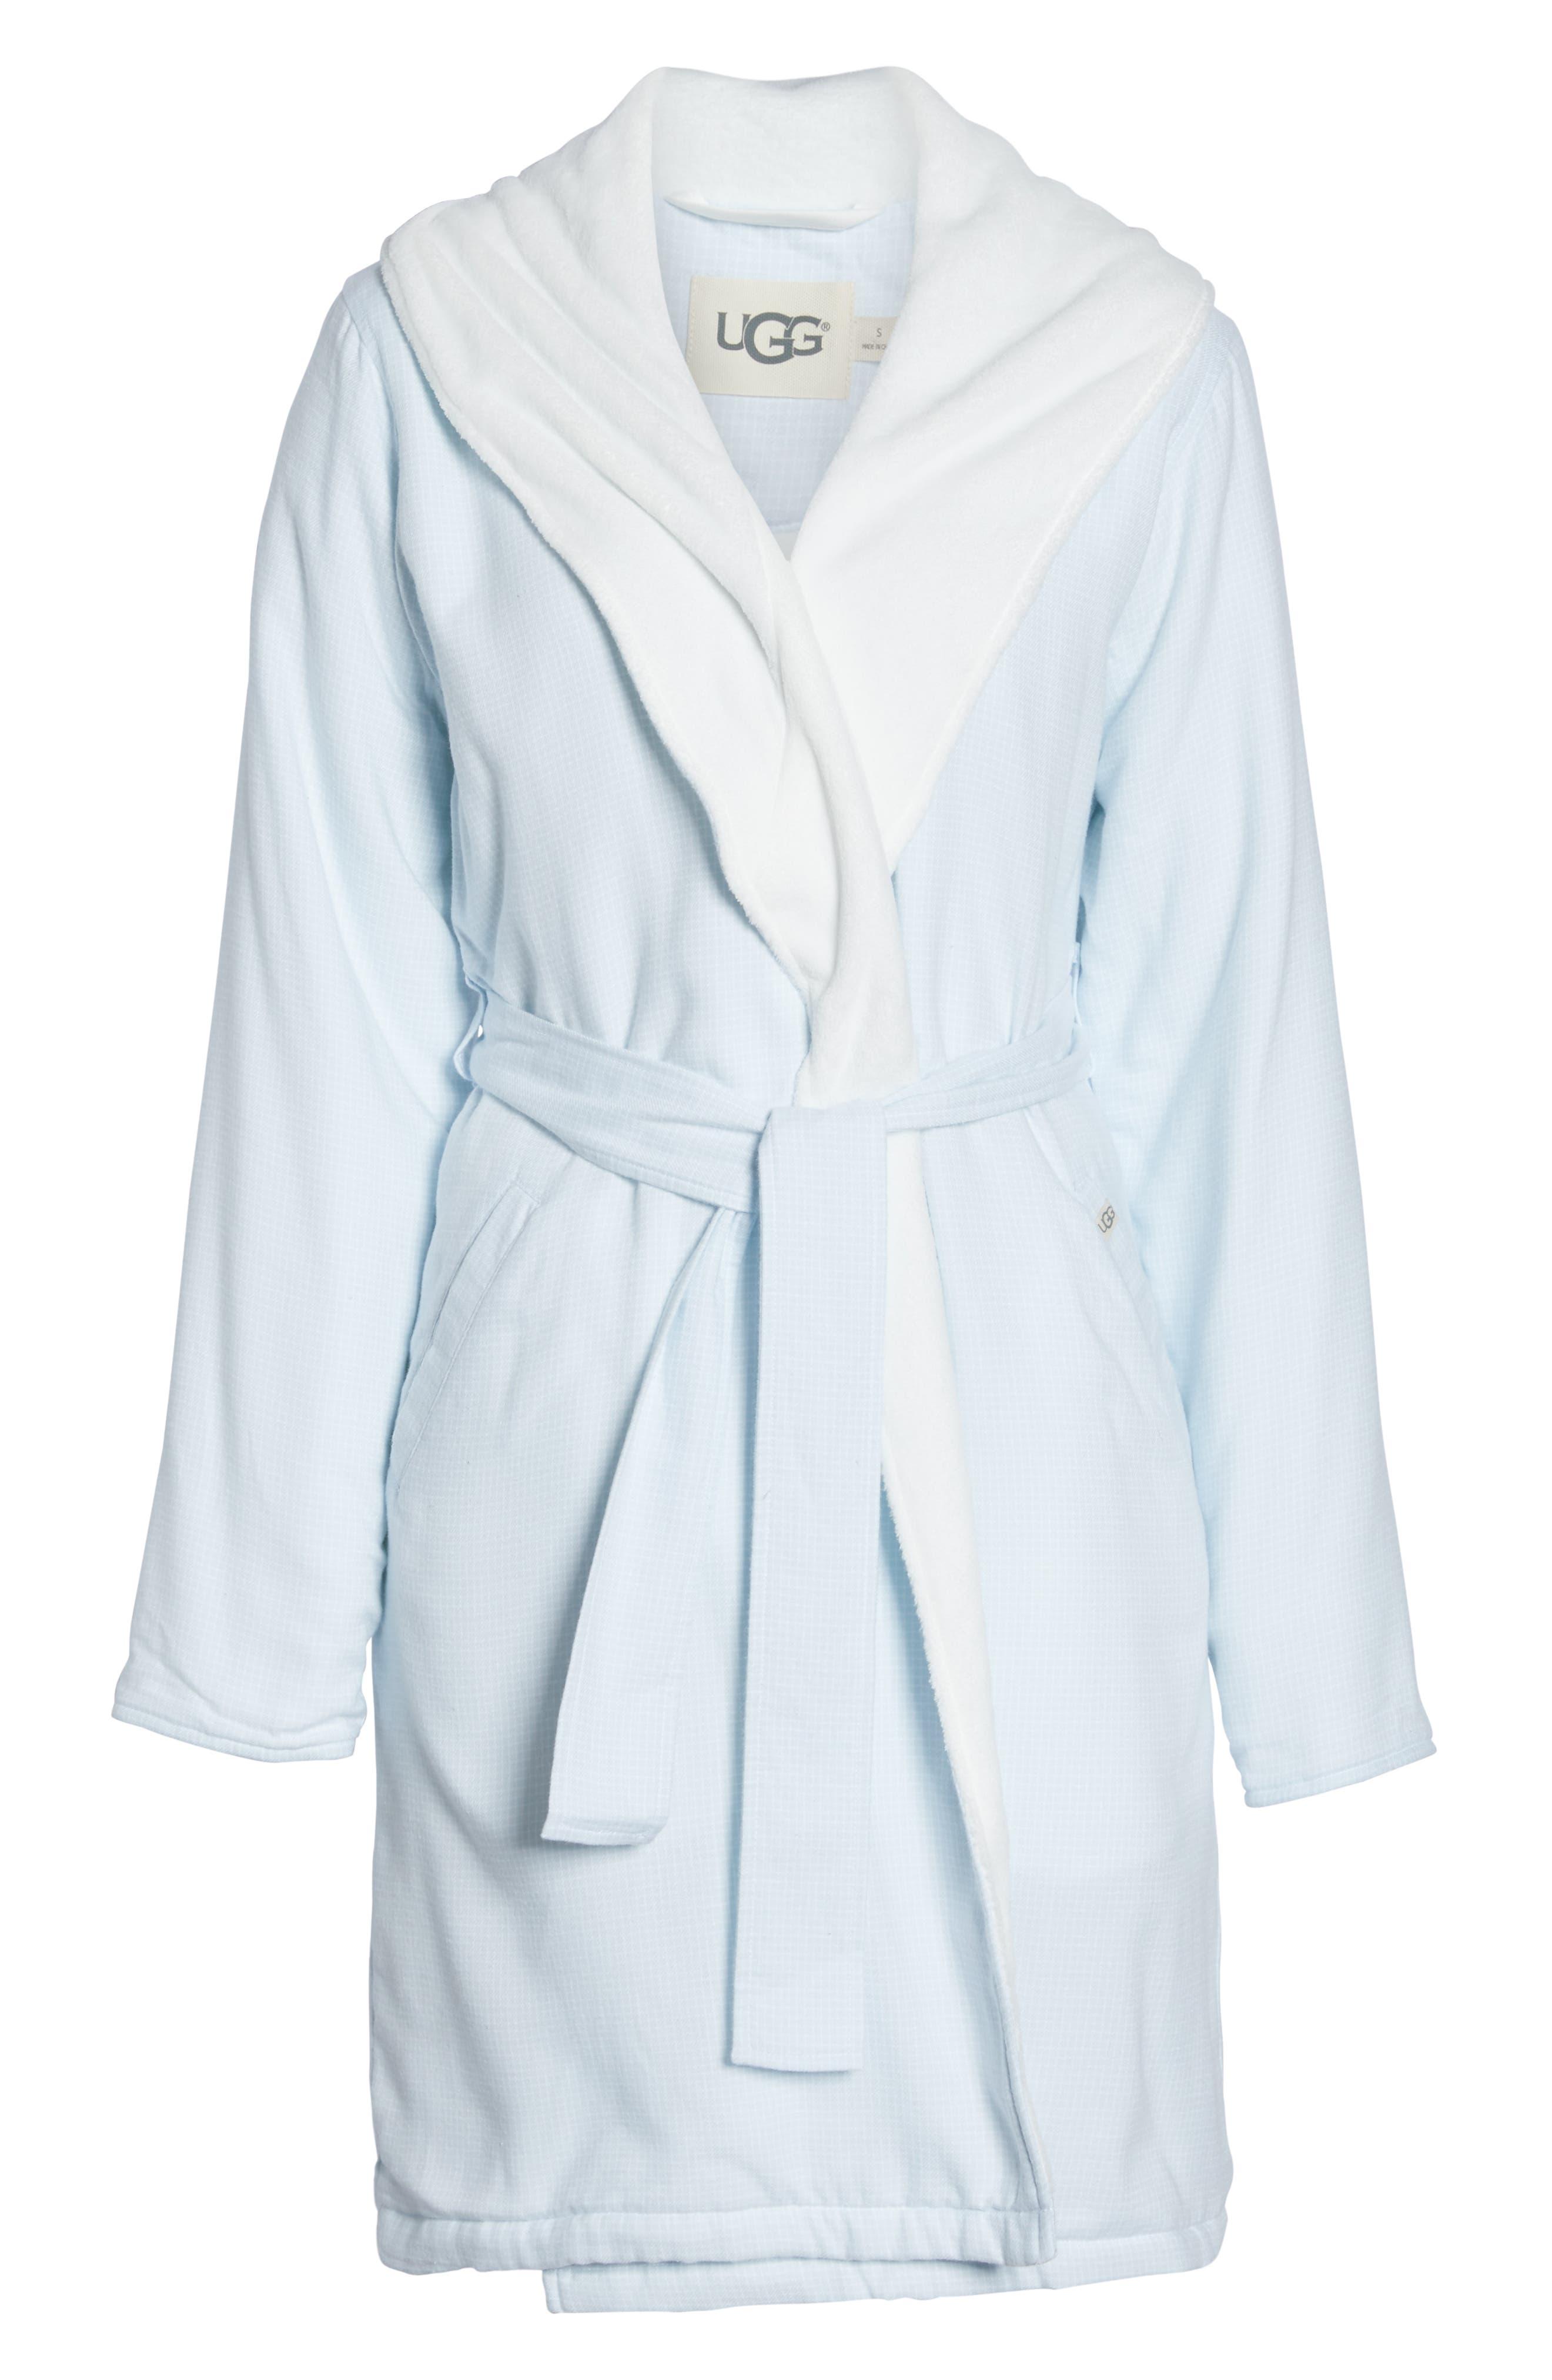 Anika Fleece Lined Flannel Robe,                             Alternate thumbnail 6, color,                             SKY BLUE / WHITE CHECK